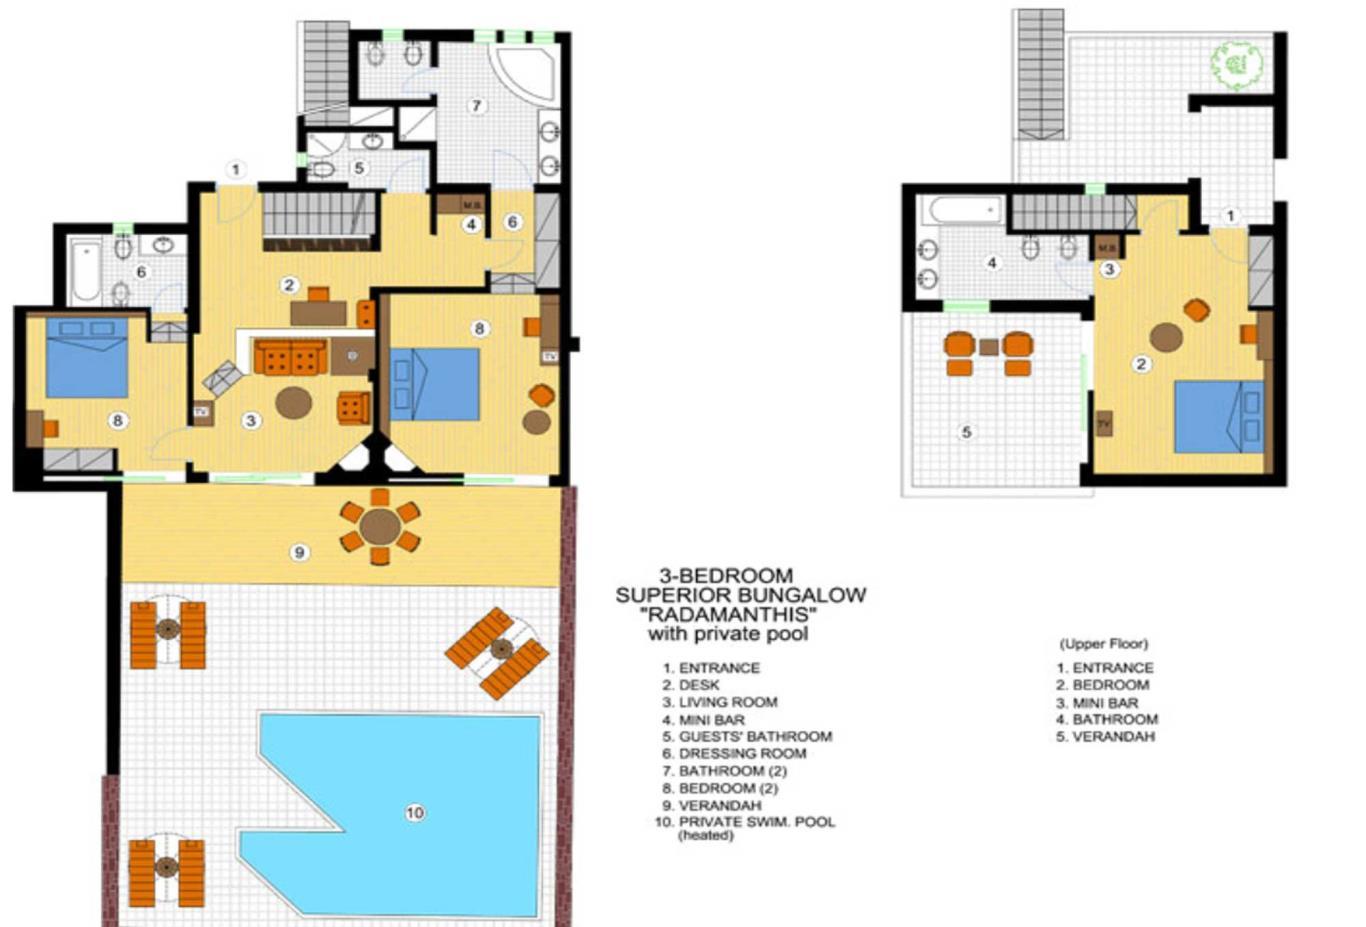 Three Bedroom Superior Bungalow with Private Pool floorplan